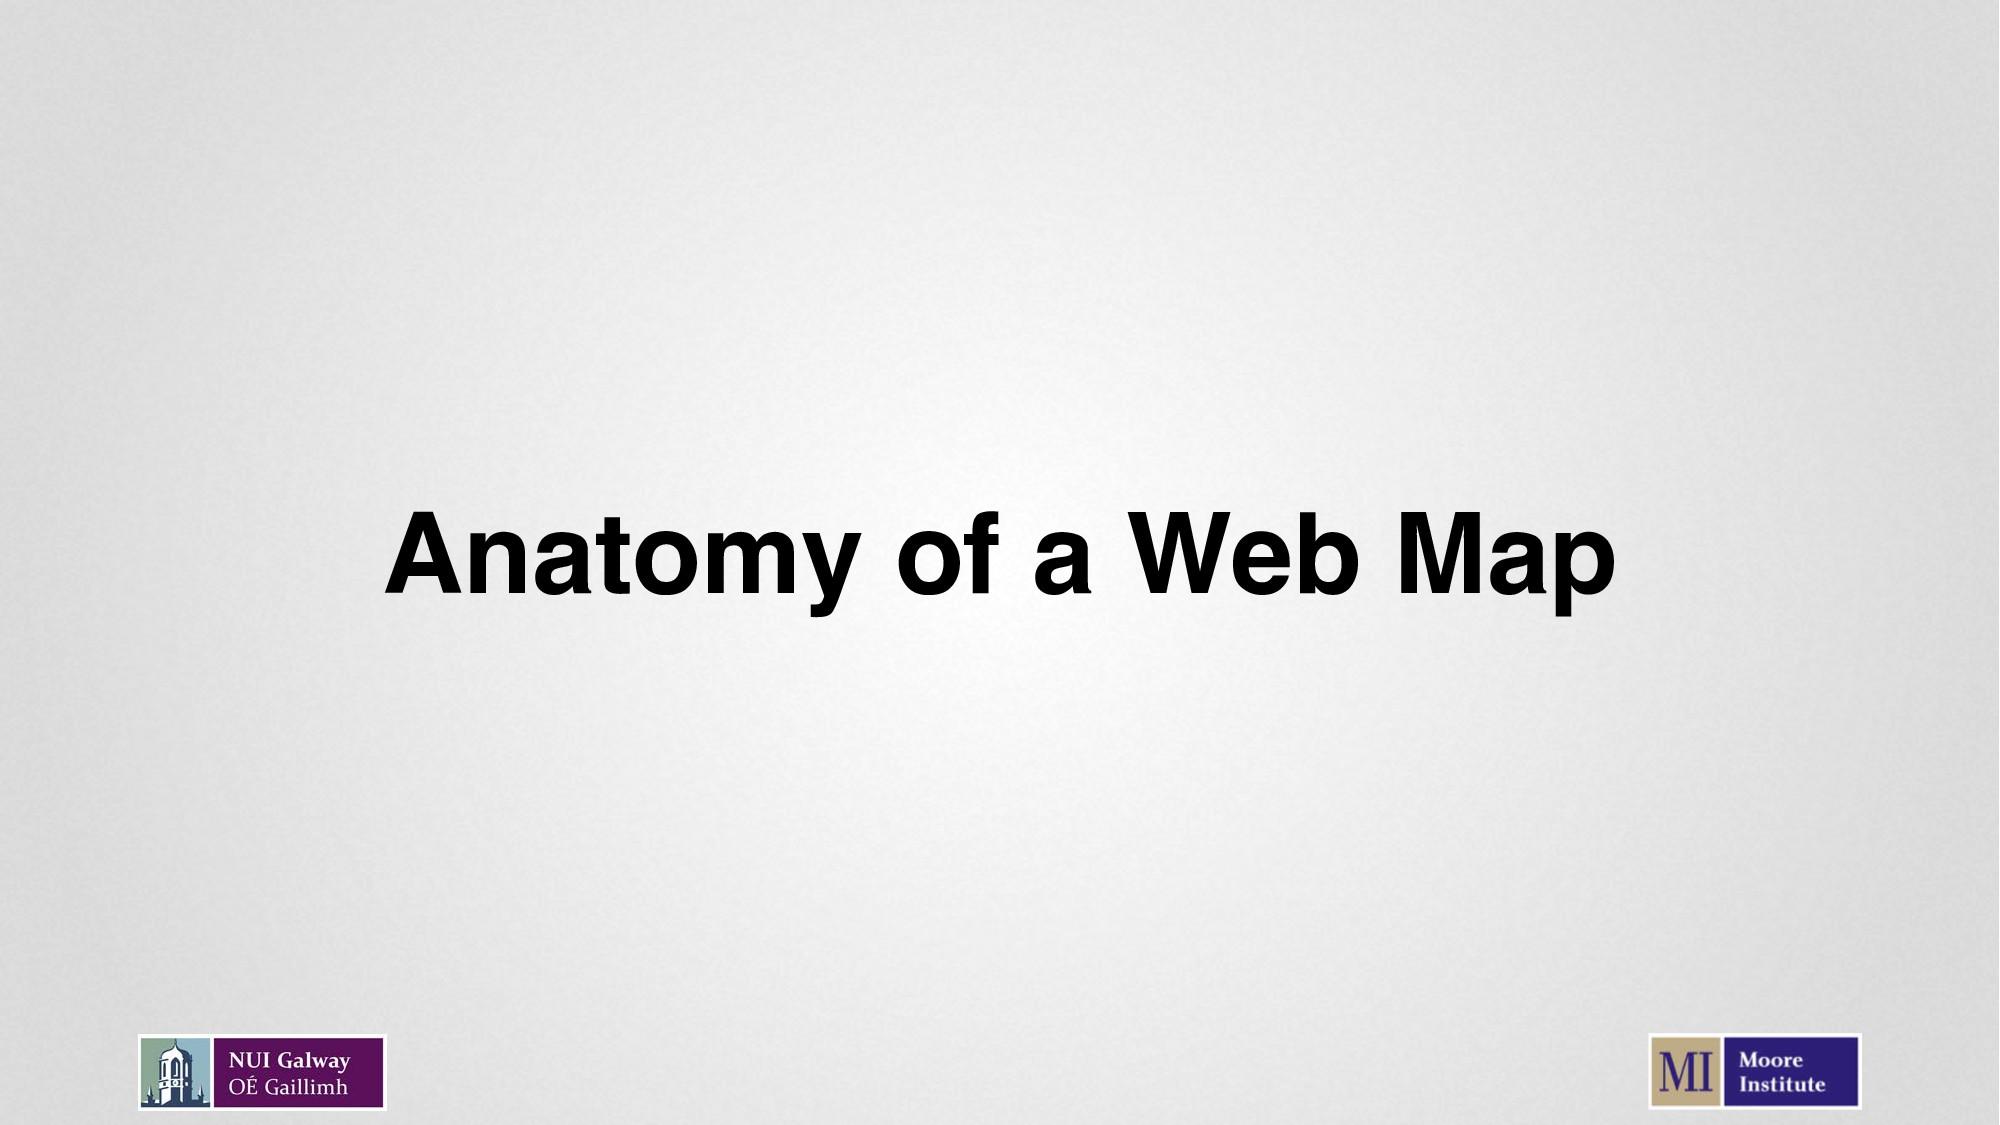 Anatomy of a Web Map